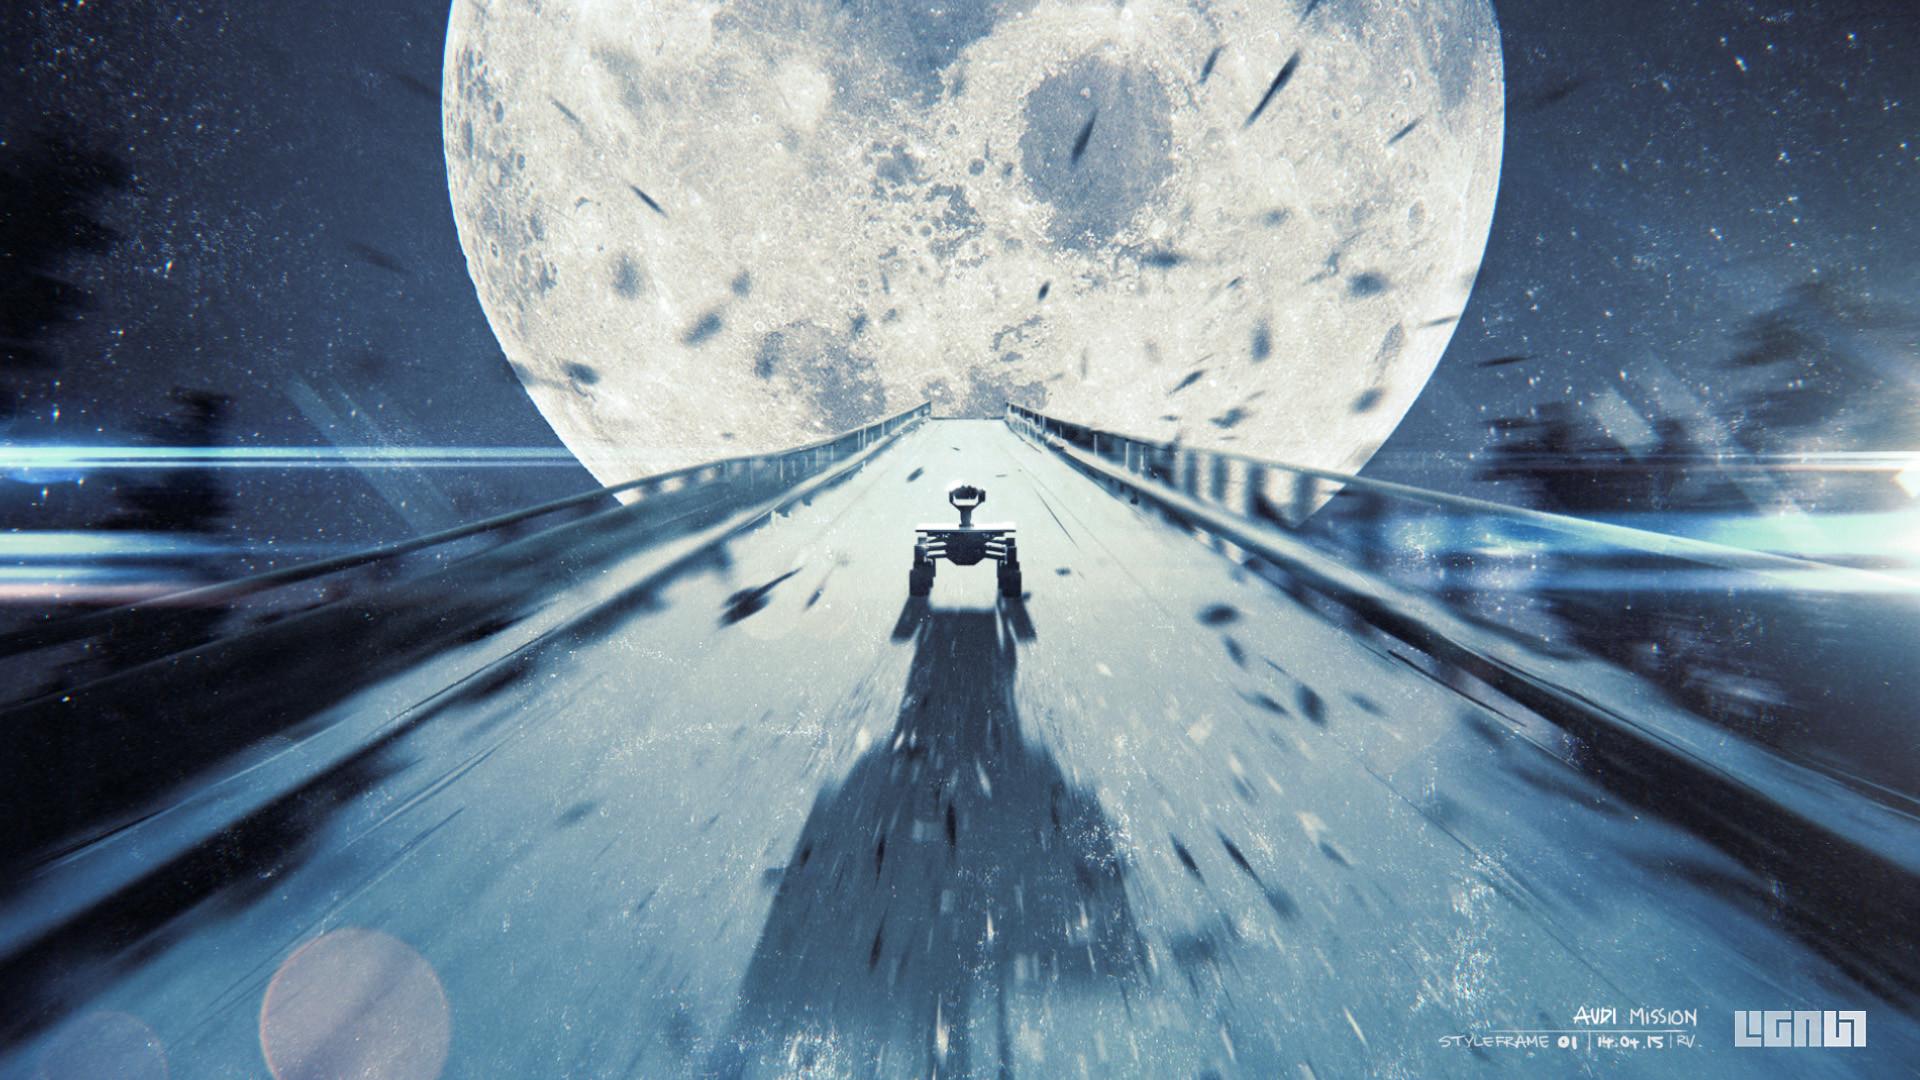 ArtStation - AUDI Mission To Moon // Storyboard & Styleframe ...